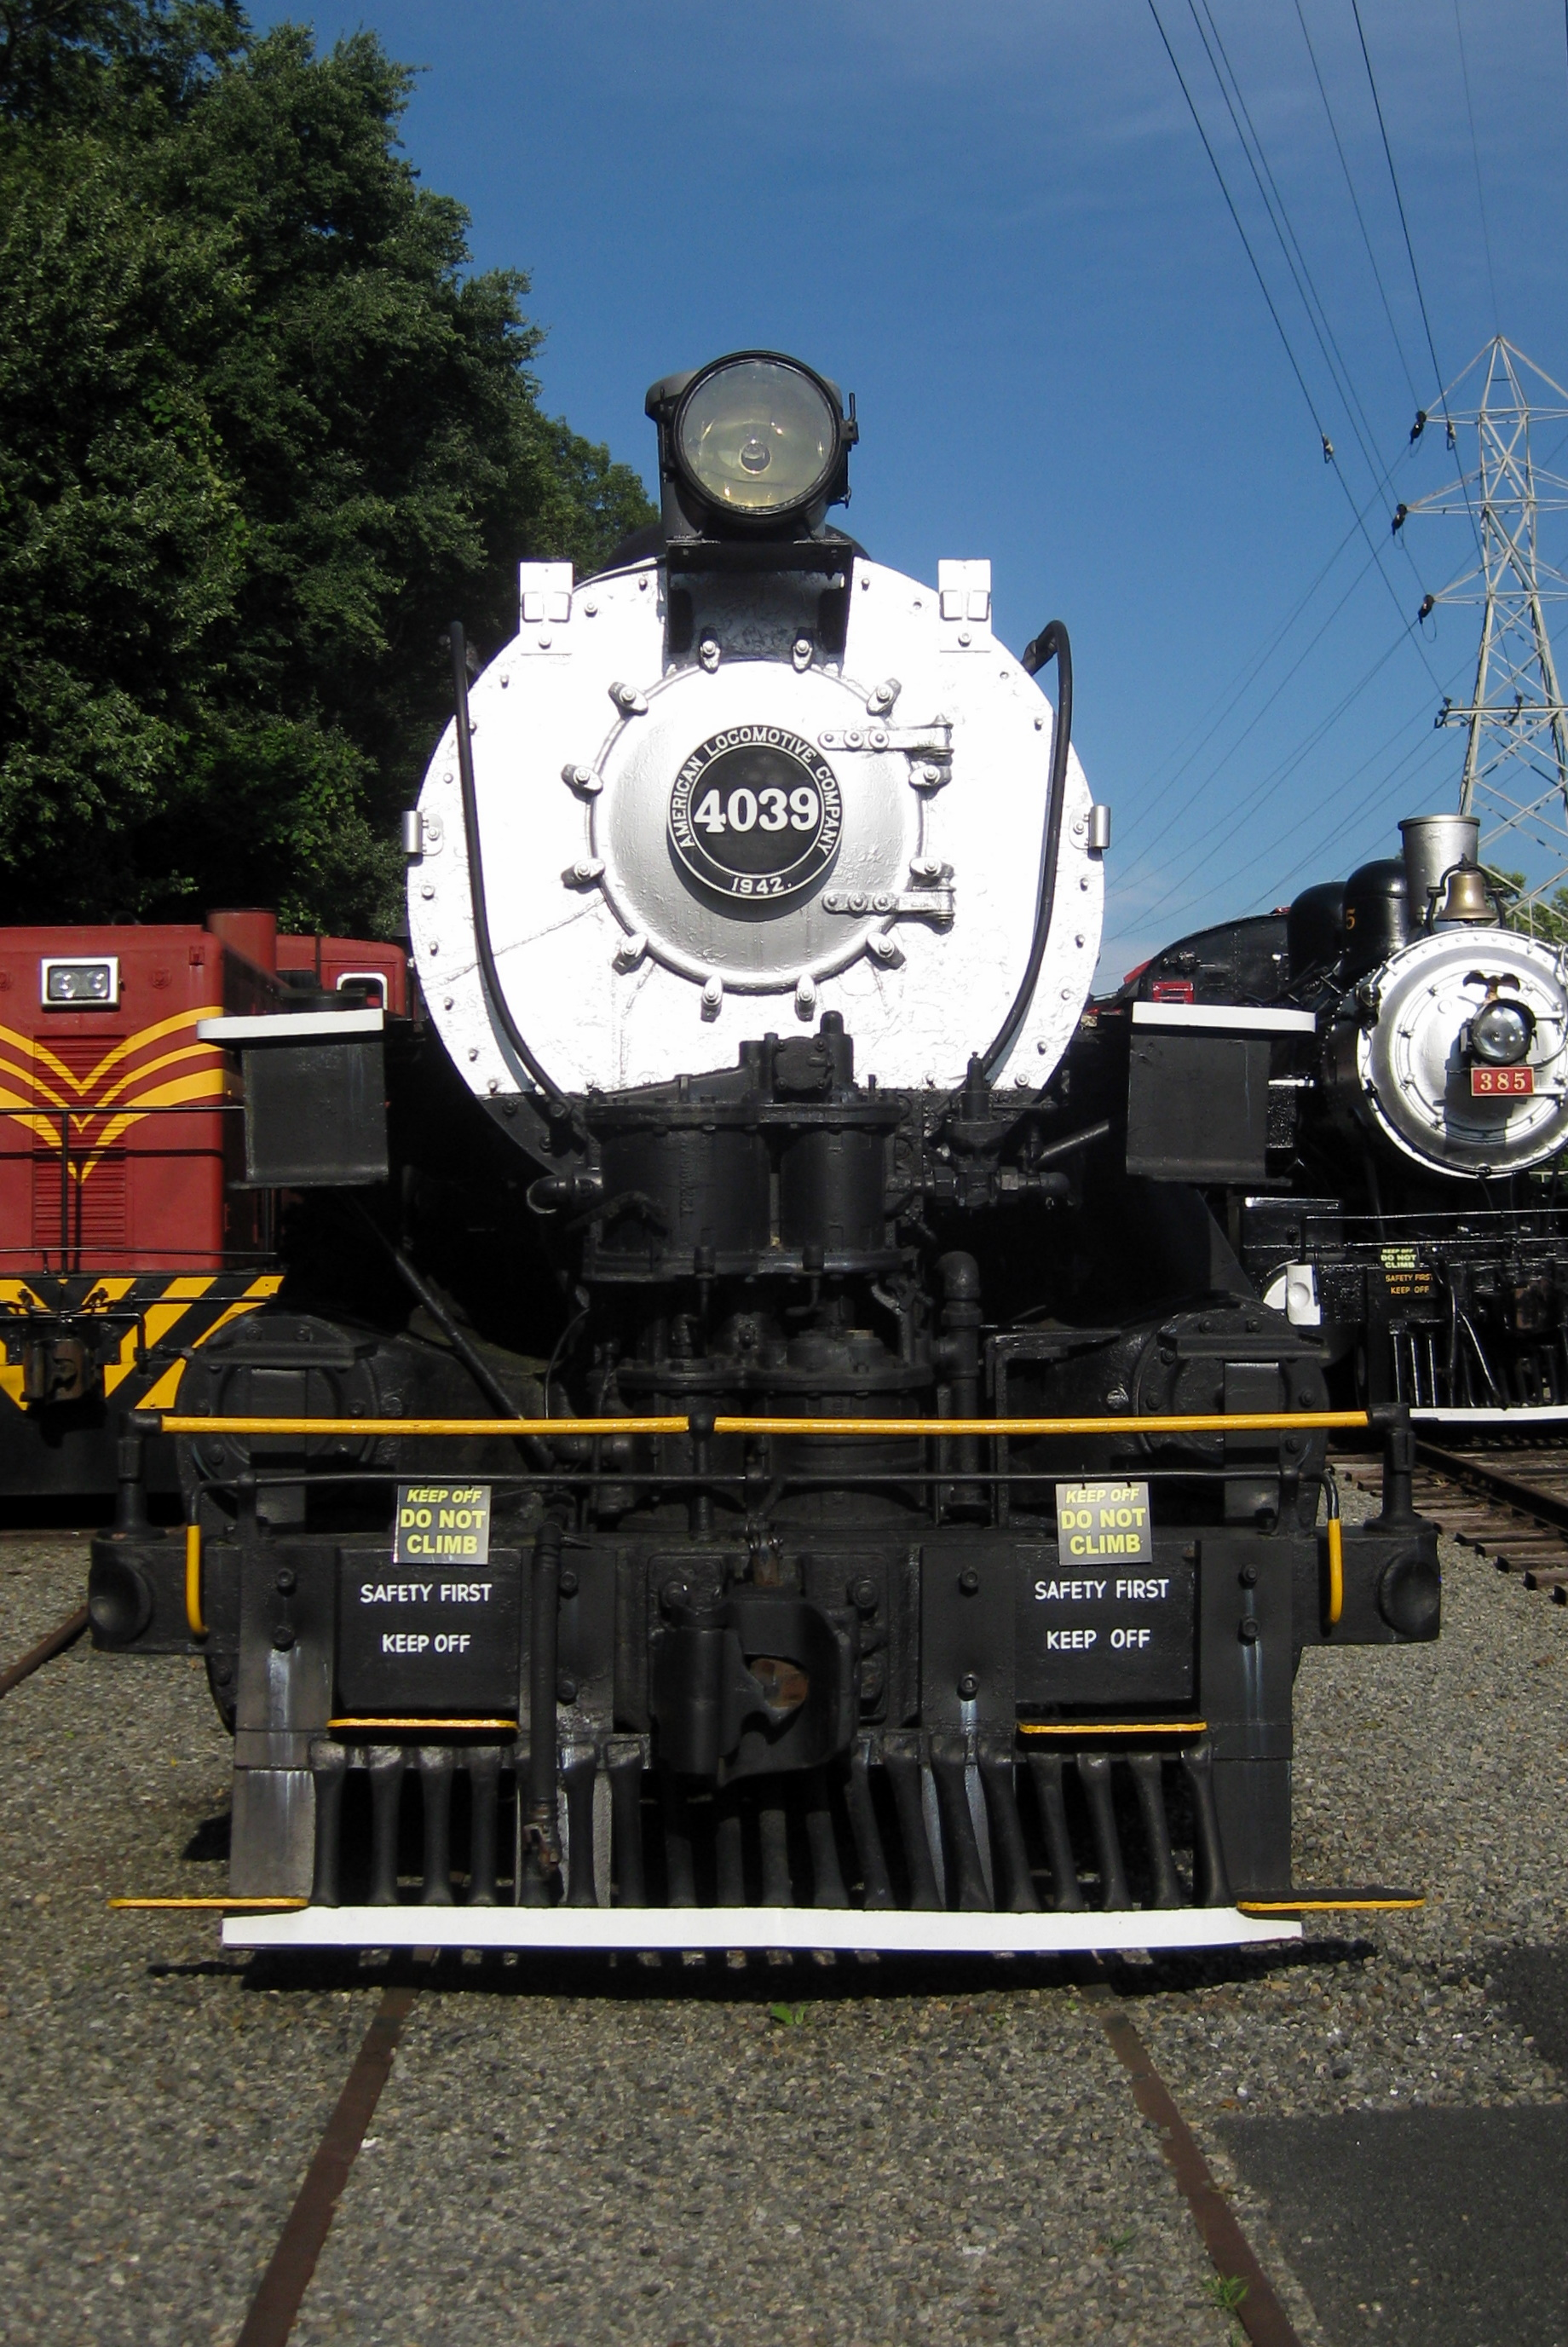 Whippany (NJ) United States  City pictures : NJ Whippany: Whippany Railway Museum United States Army Steam ...